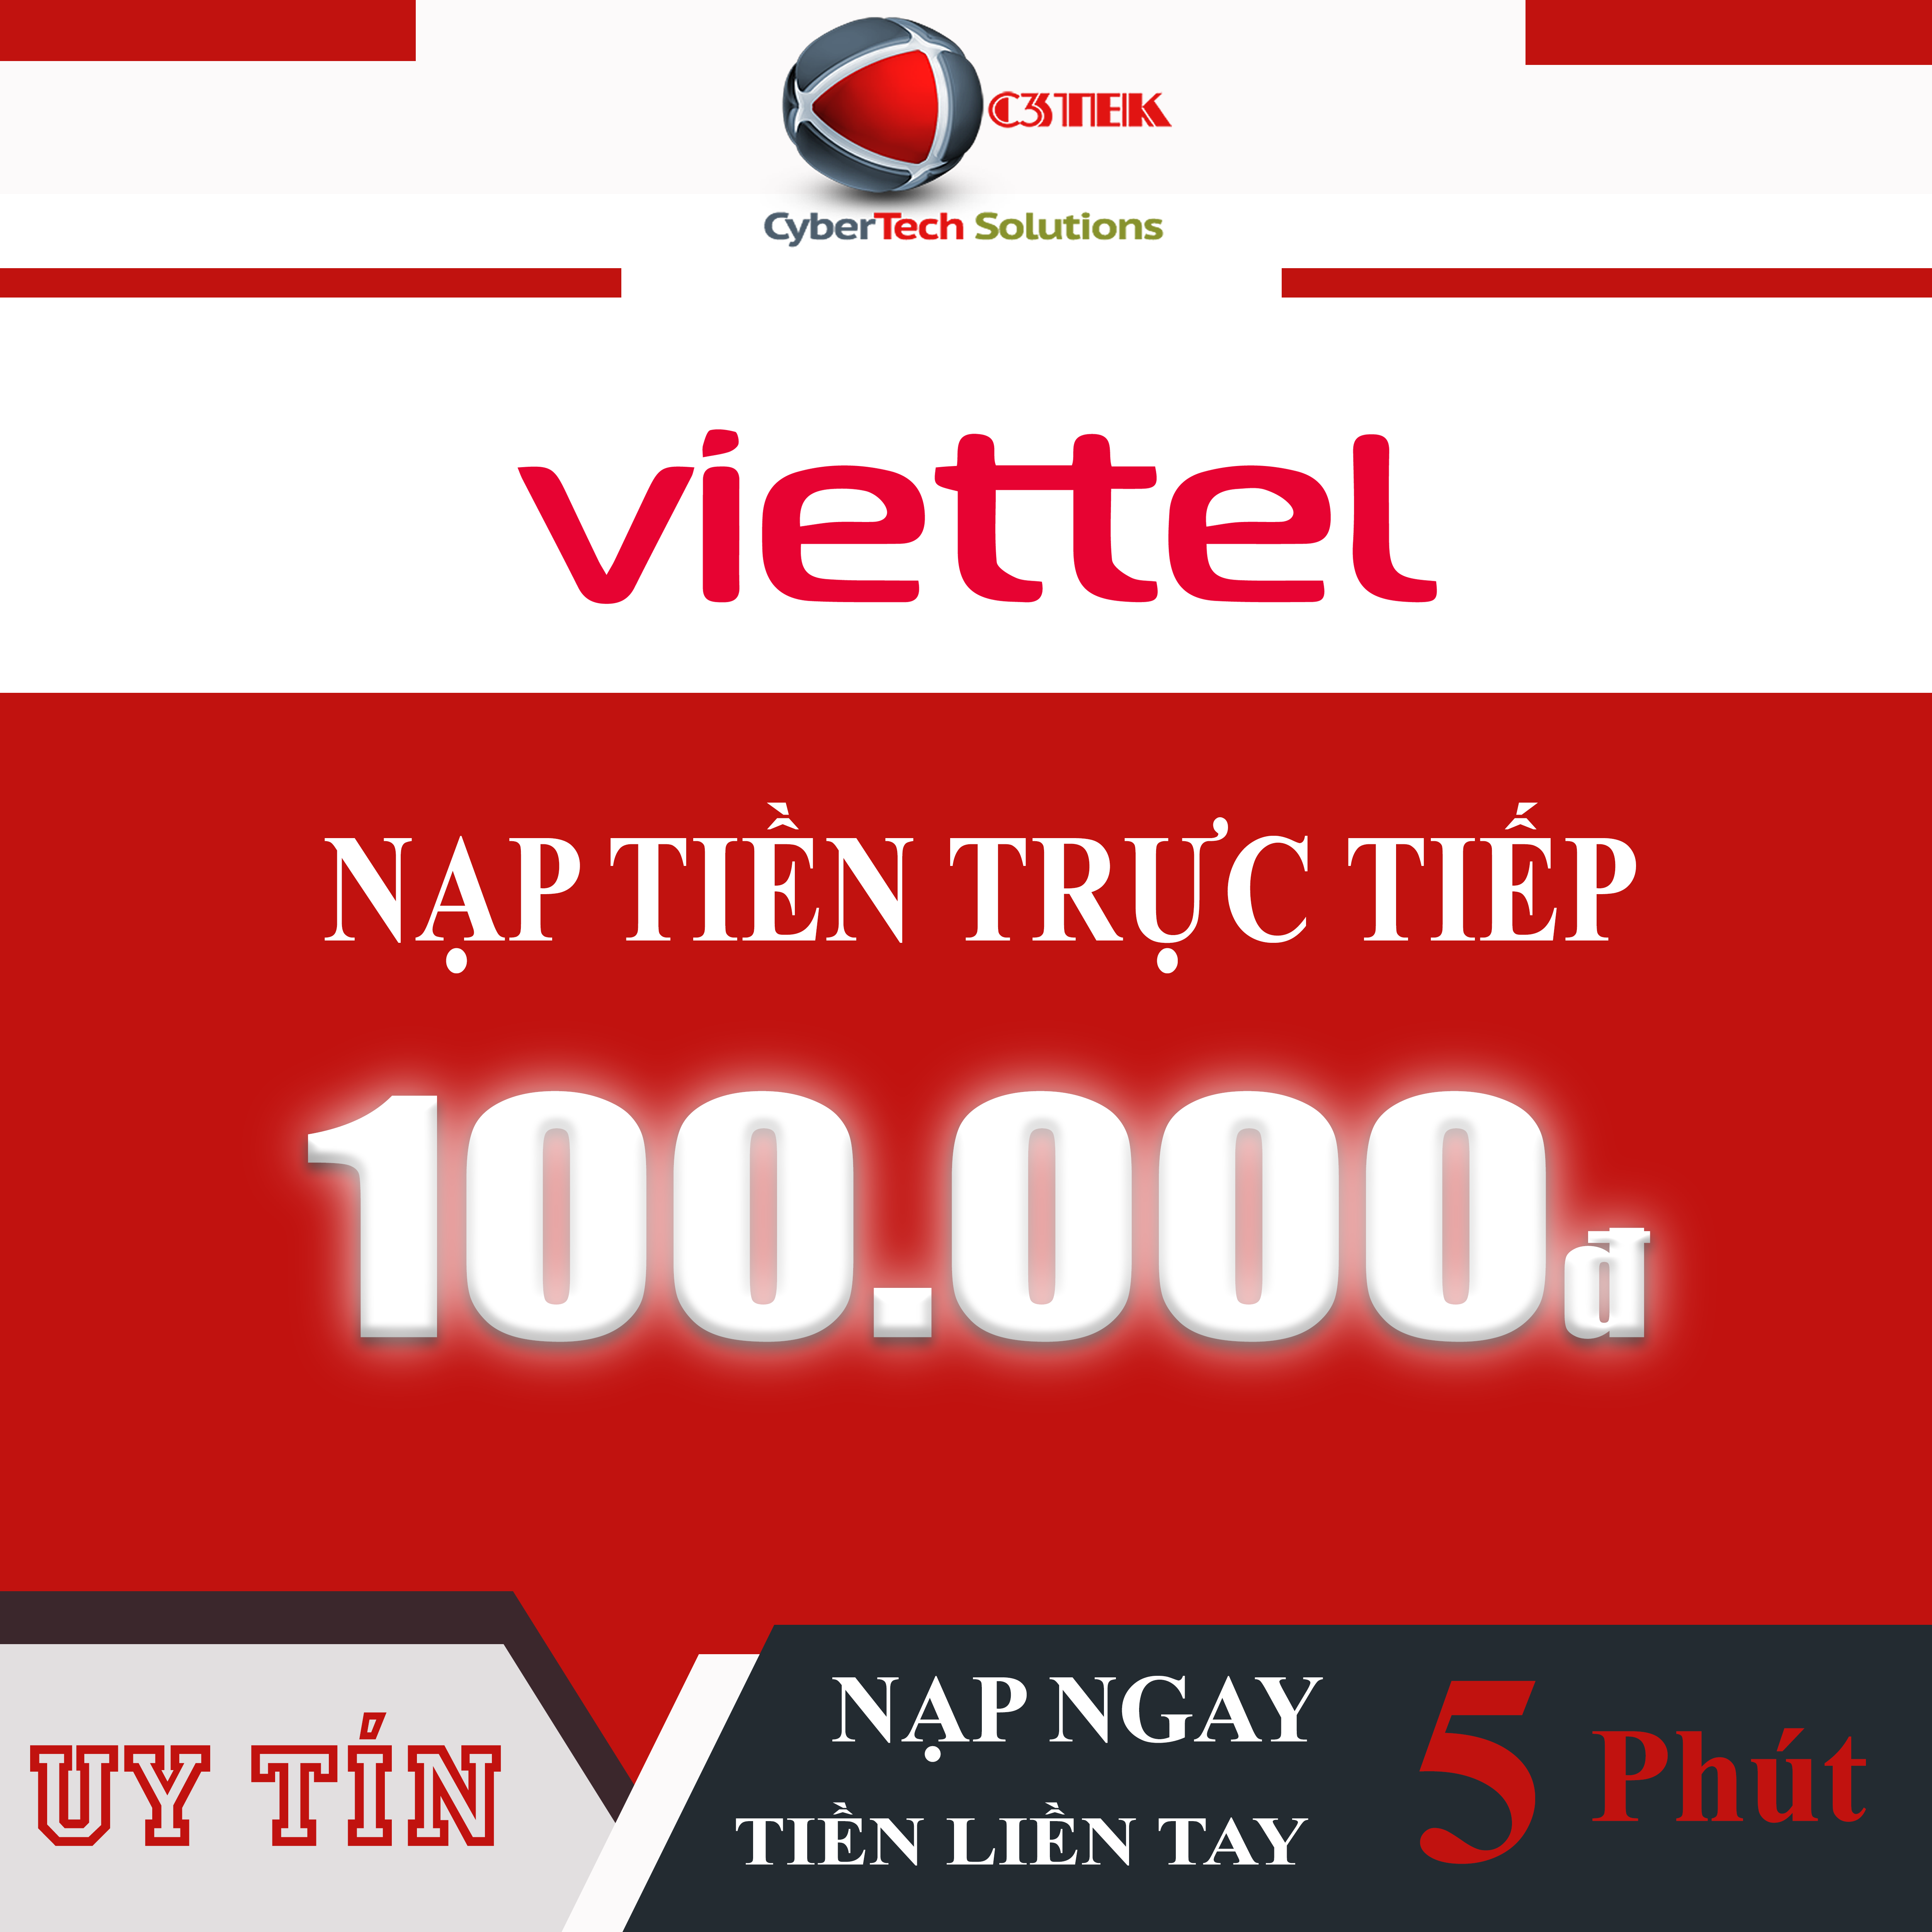 FS- Nạp tiền (Nạp Thẻ Trực Tiếp) Viettel 100K (TRẢ TRƯỚC) - C3TEK